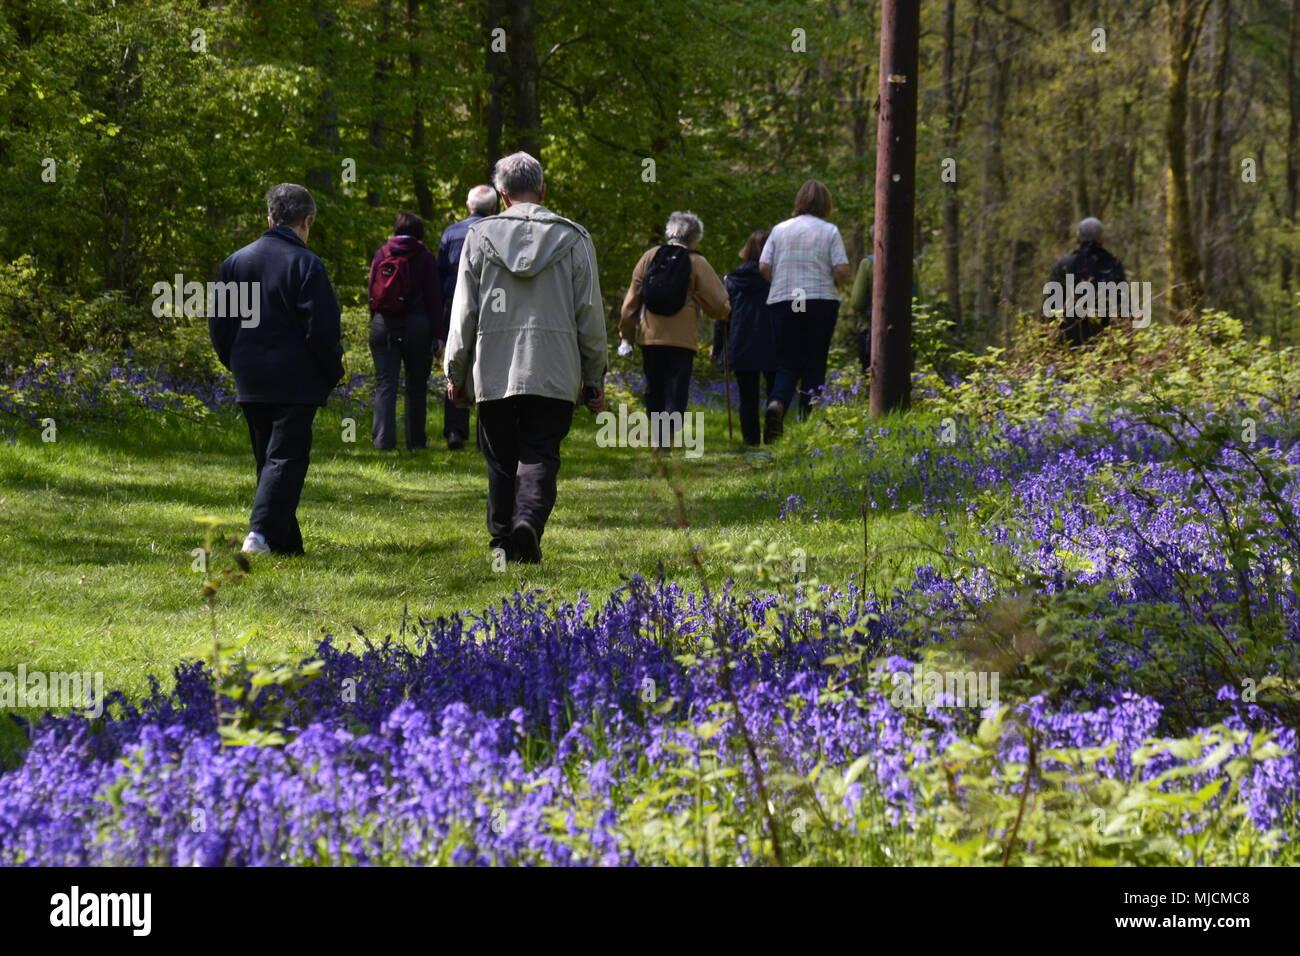 People walking through bluebells in Cowleaze Woods, England UK - Stock Image